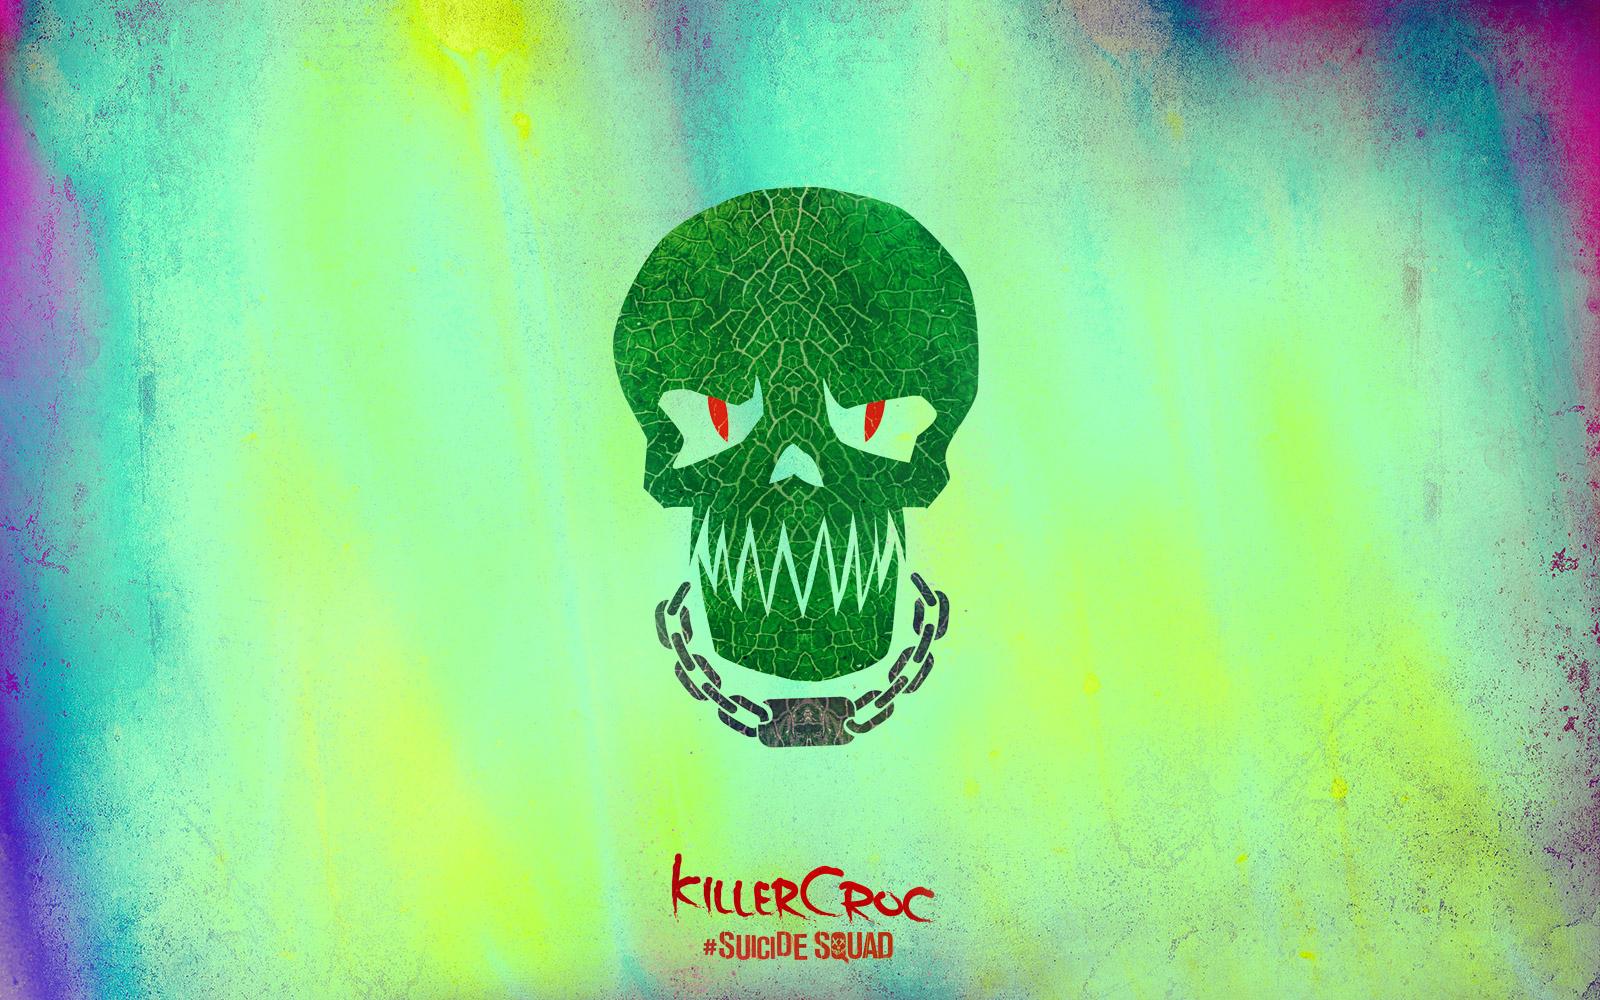 Suicide Squad Skull 바탕화면 - Killer Croc